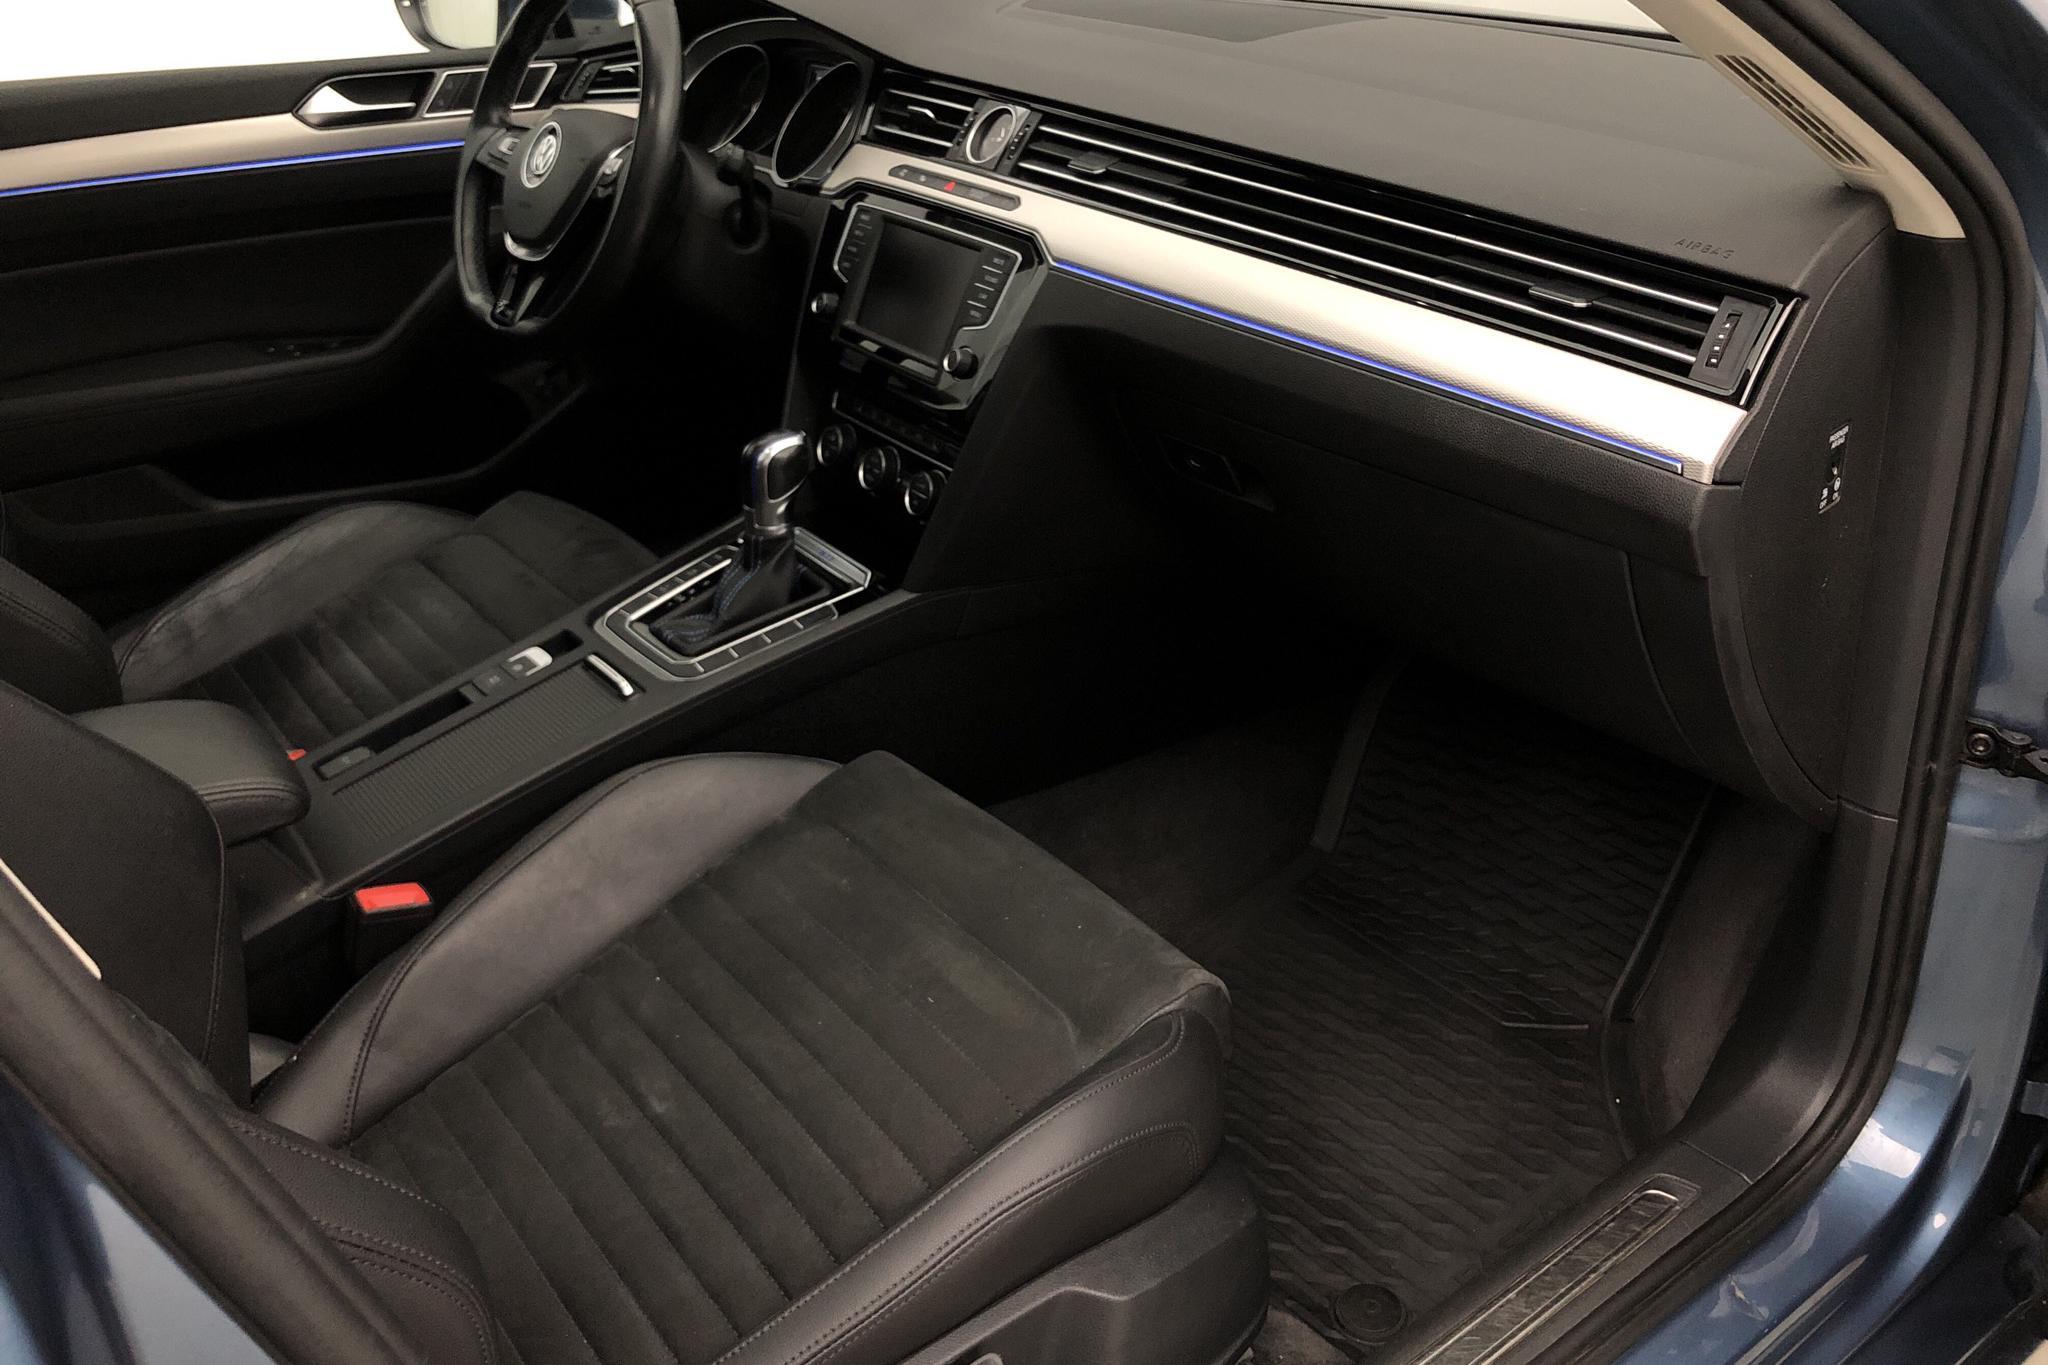 VW Passat 1.4 Plug-in-Hybrid Sportscombi (218hk) - 14 560 mil - Automat - blå - 2017